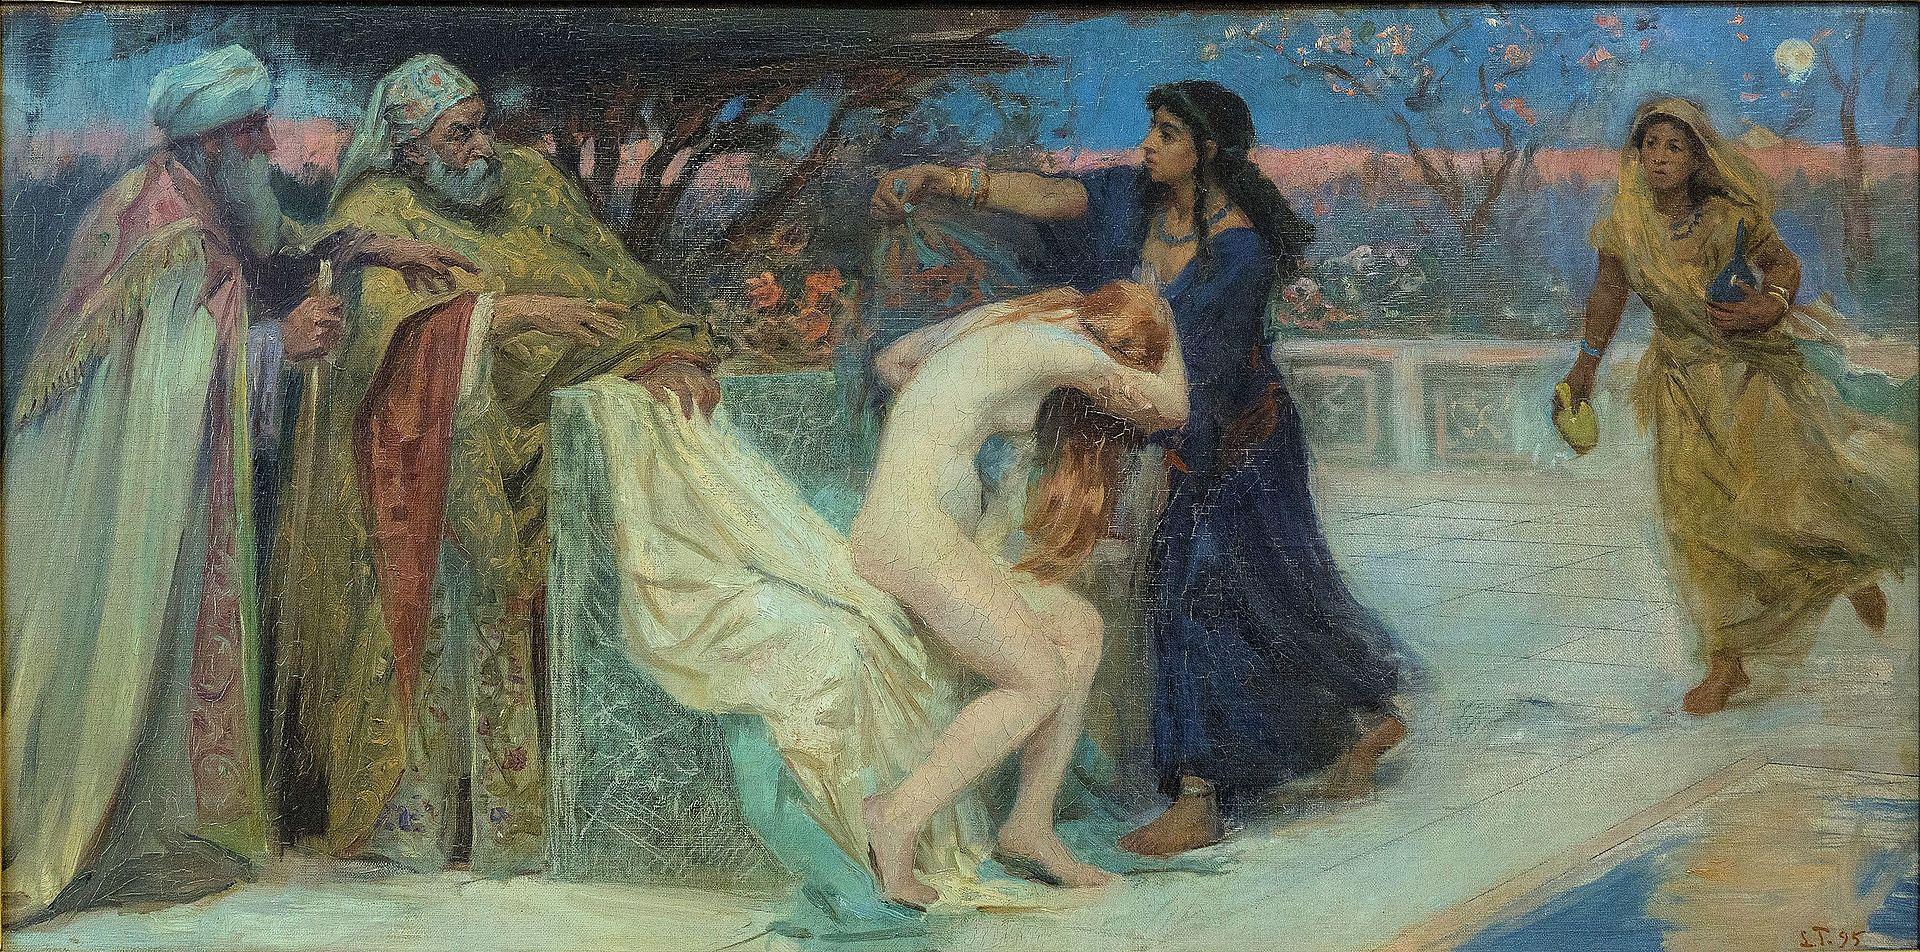 Susanna i badet, 1895, 43 x 88 cm privateje.jpg